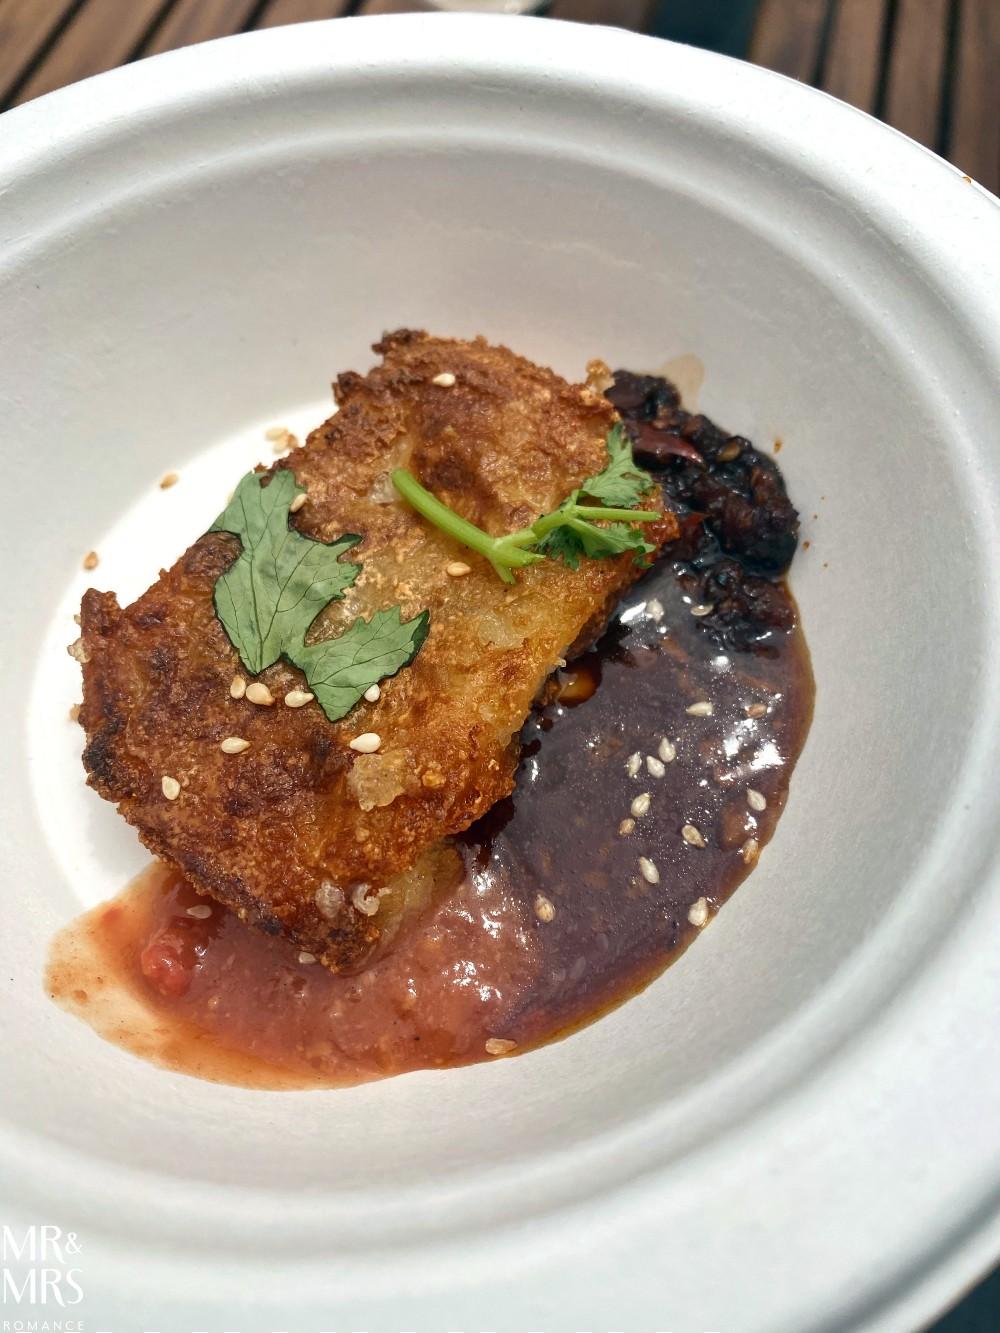 Hurstville food tour with Taste Cultural Food Tours - radish cake